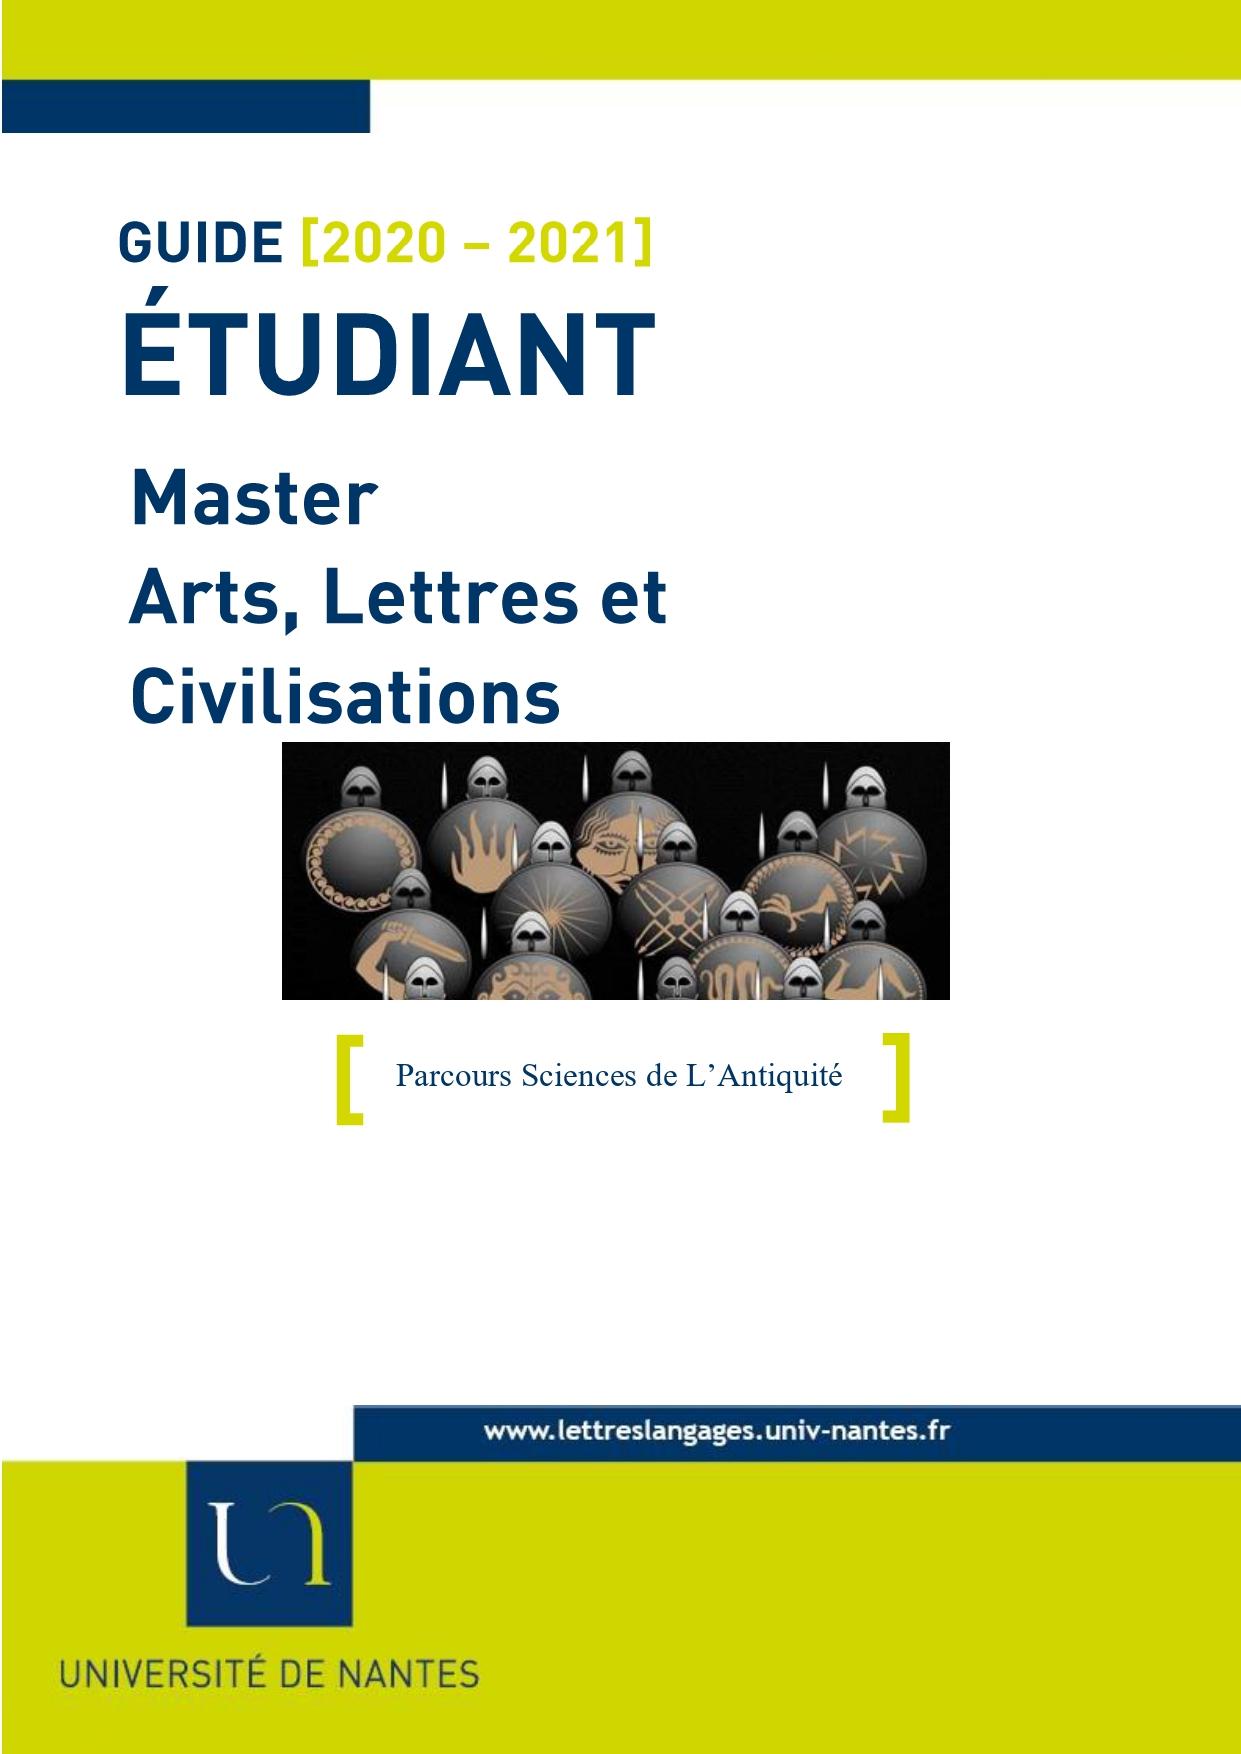 Master Arts lettres et civilisation